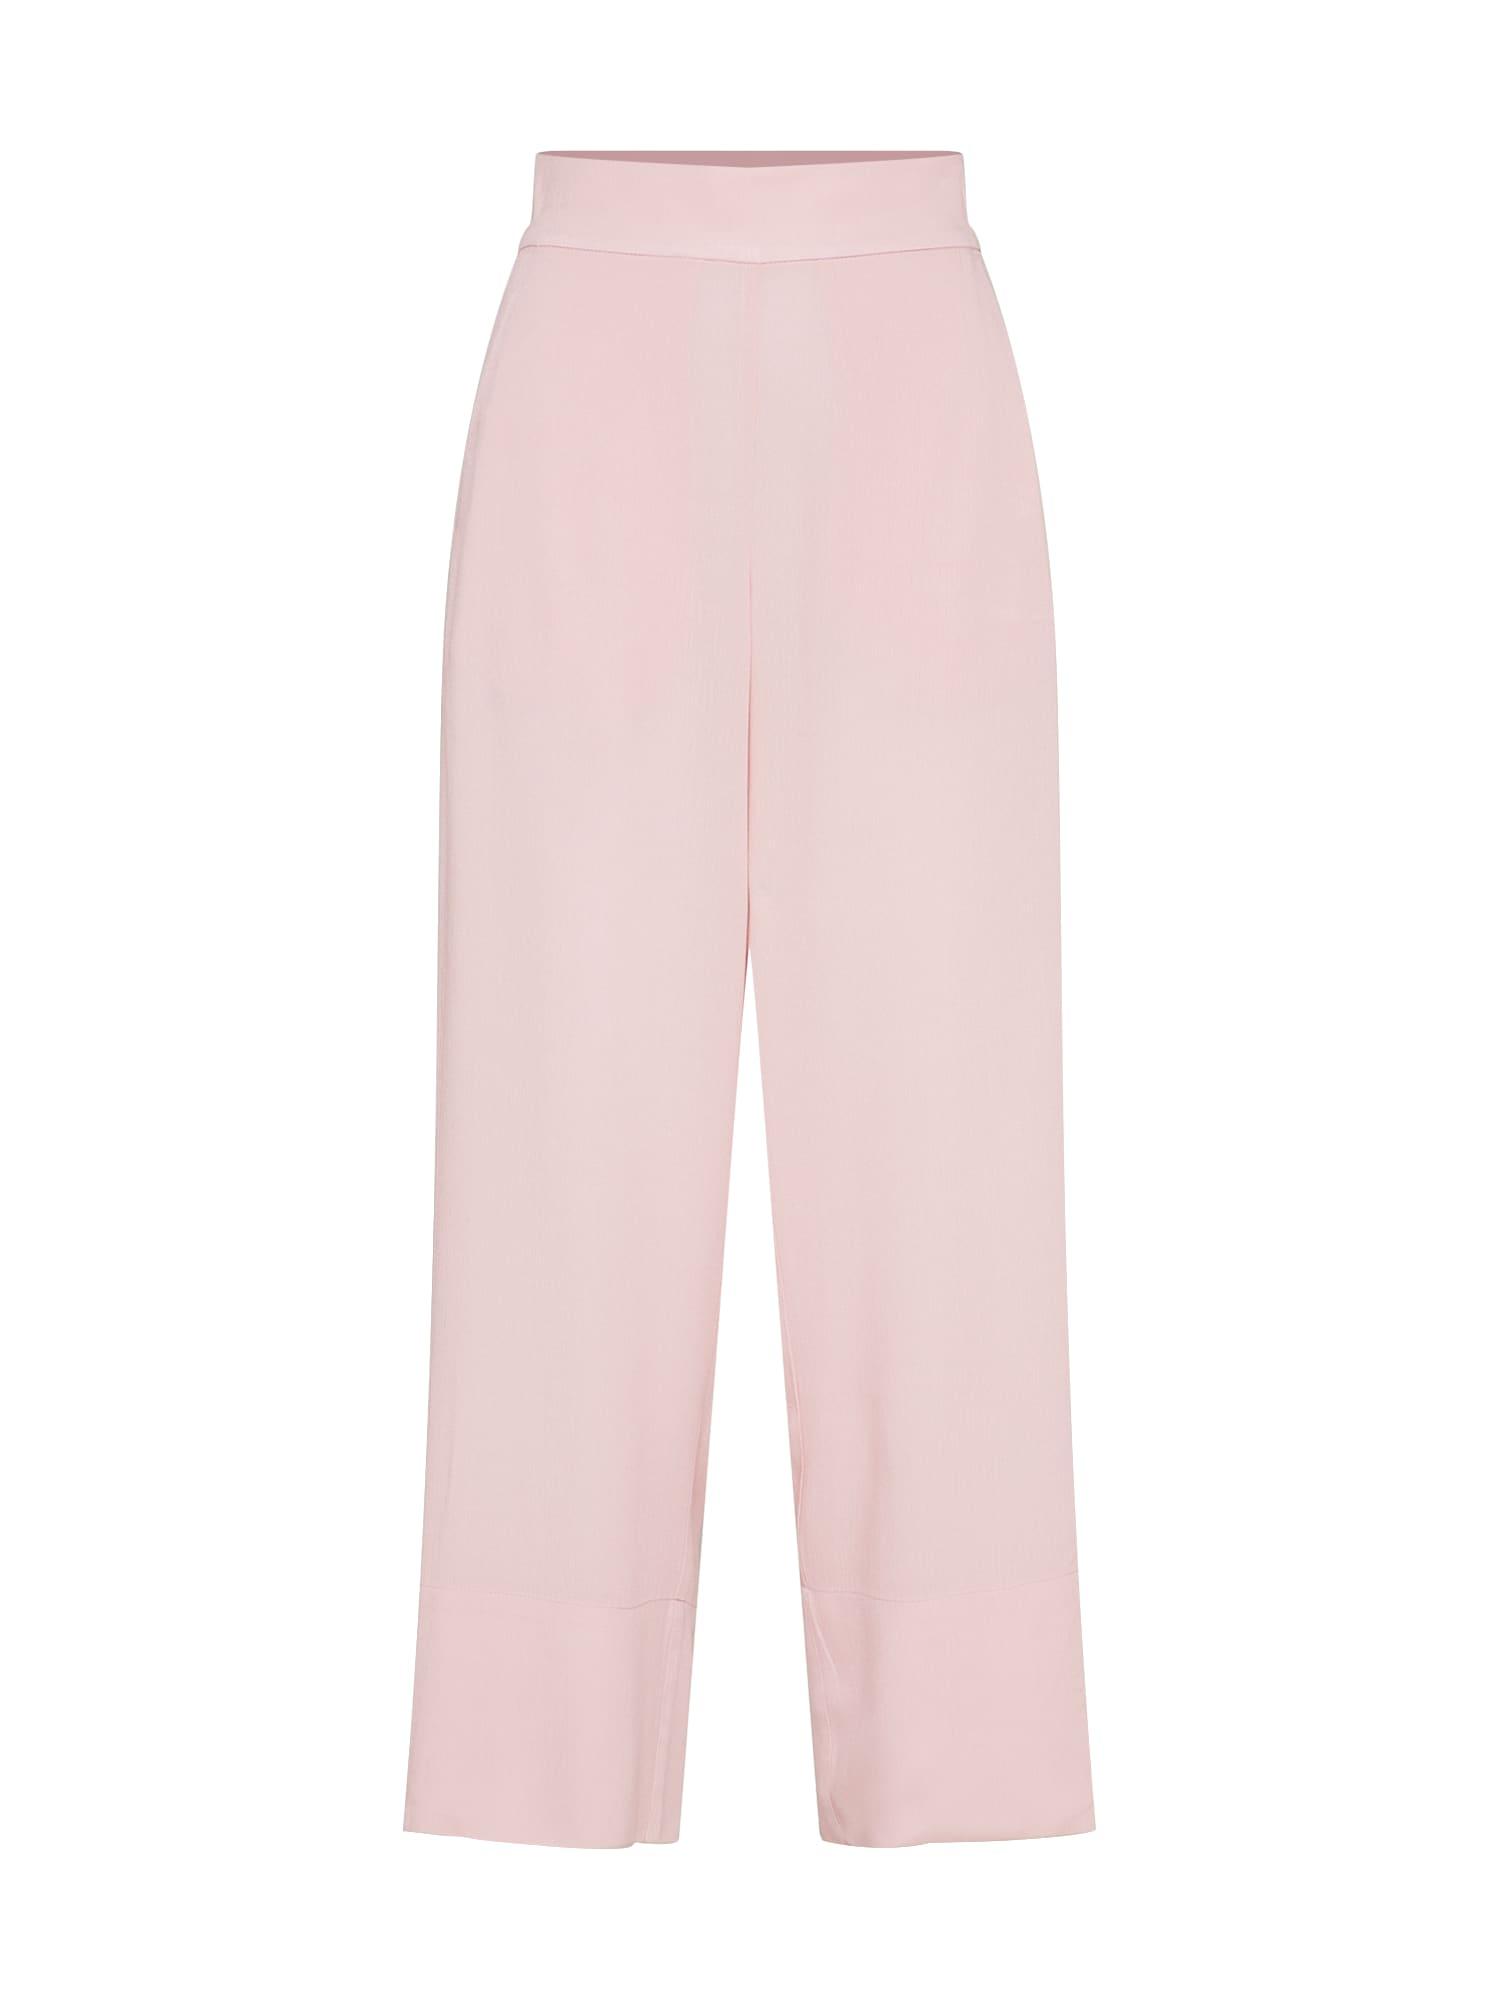 Kalhoty Jania růžová EDITED